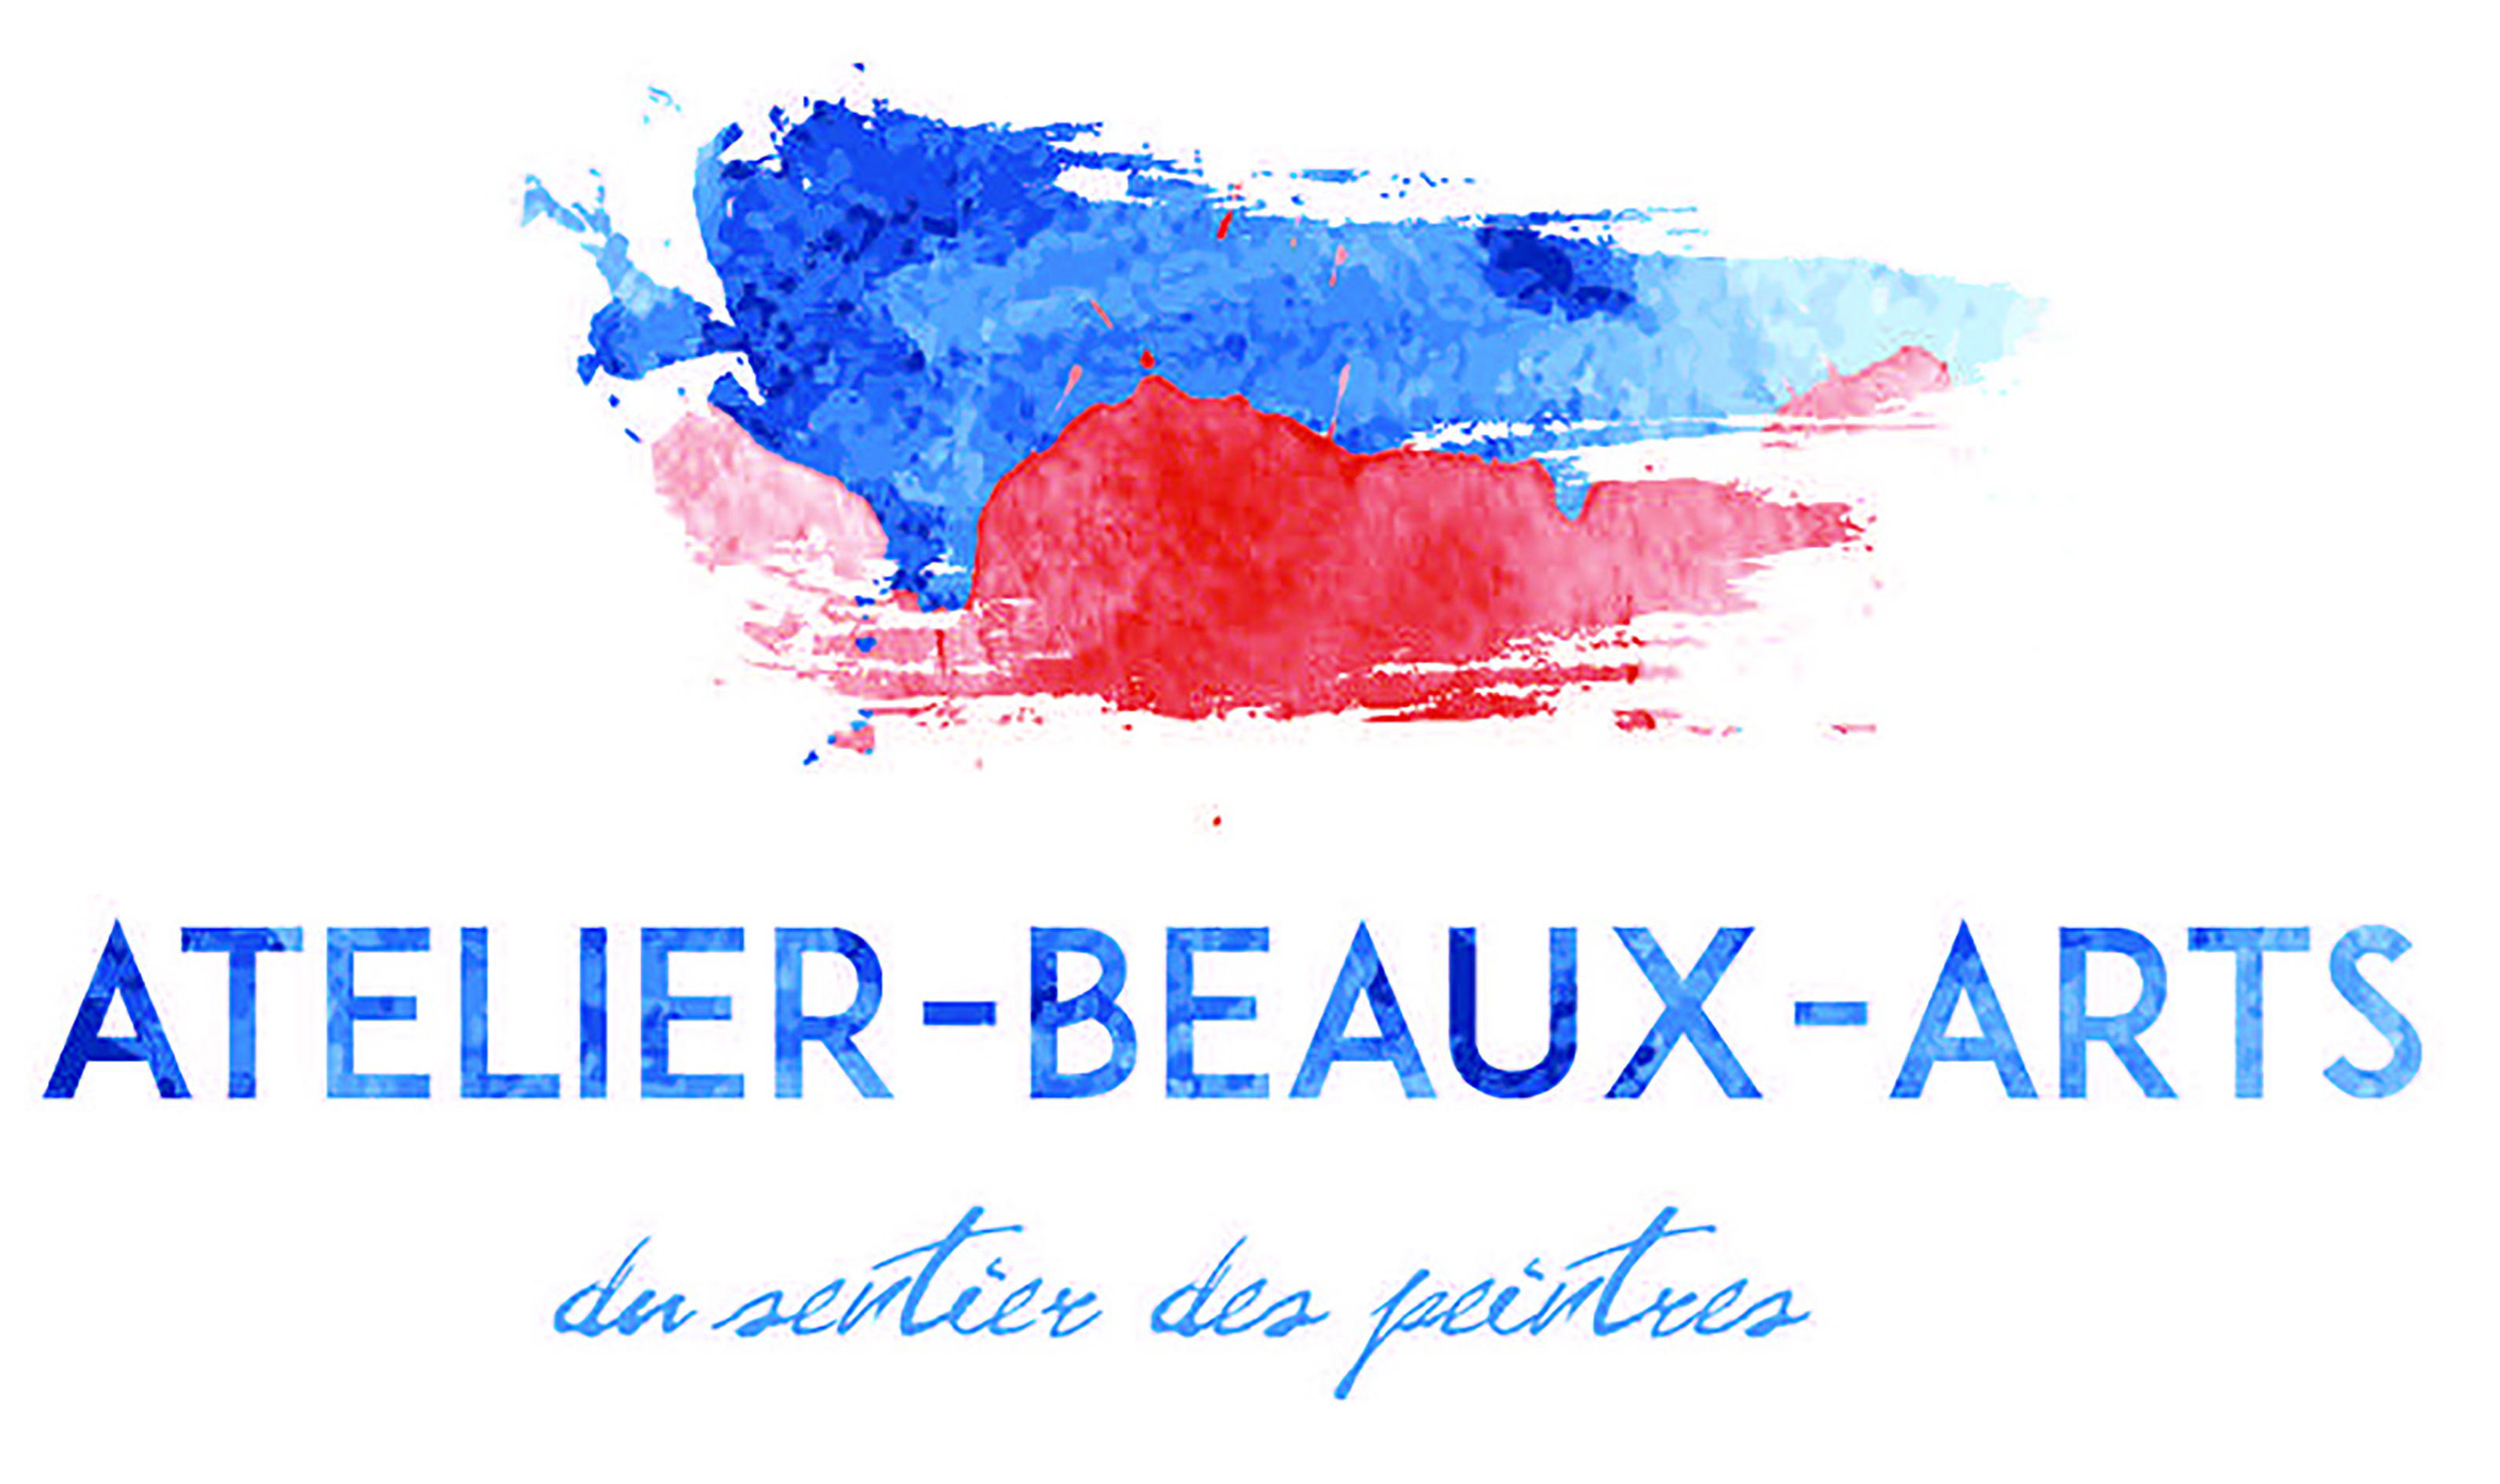 Atelier Beaux Arts